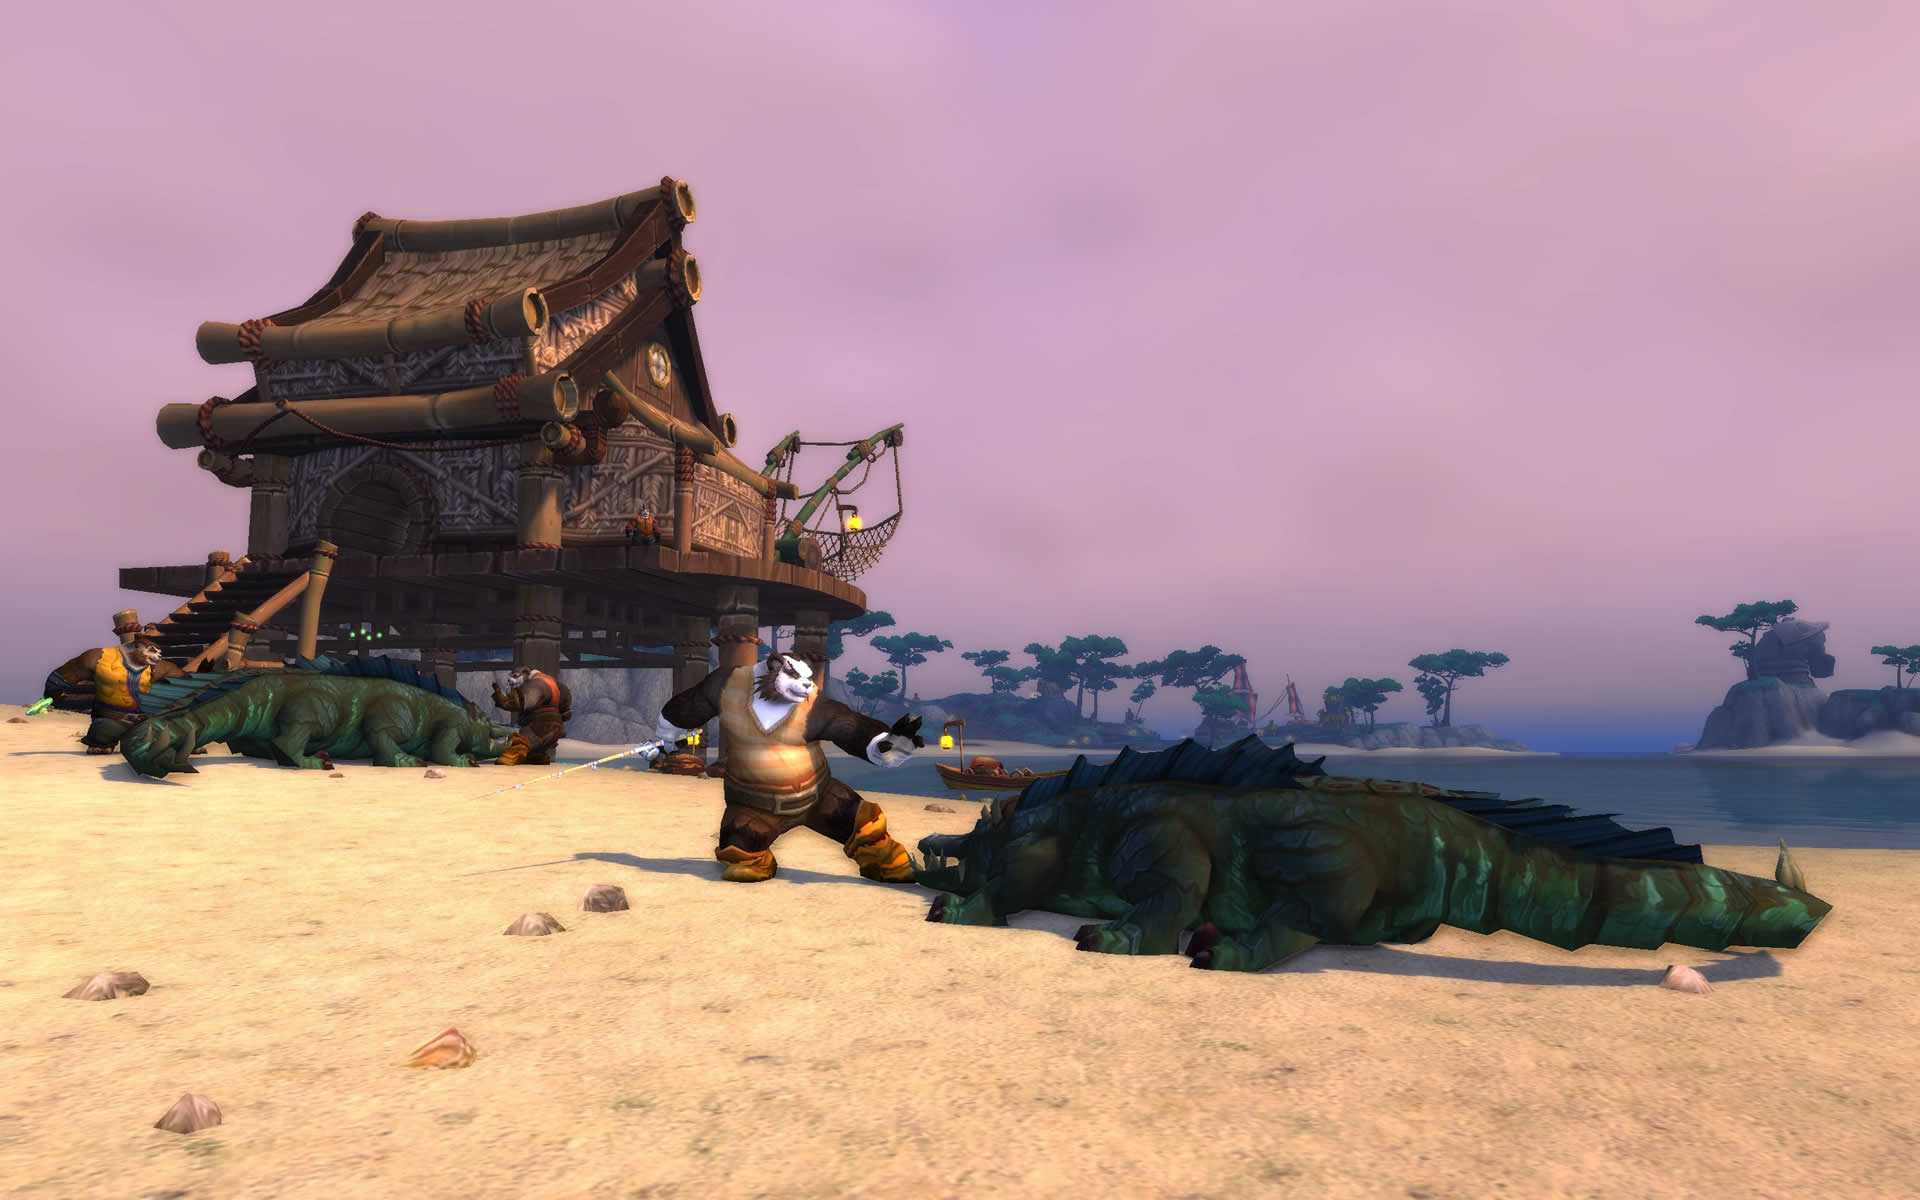 Wow Mists Of Pandaria Wallpaper - World Of Warcraft: Mists Of Pandaria , HD Wallpaper & Backgrounds